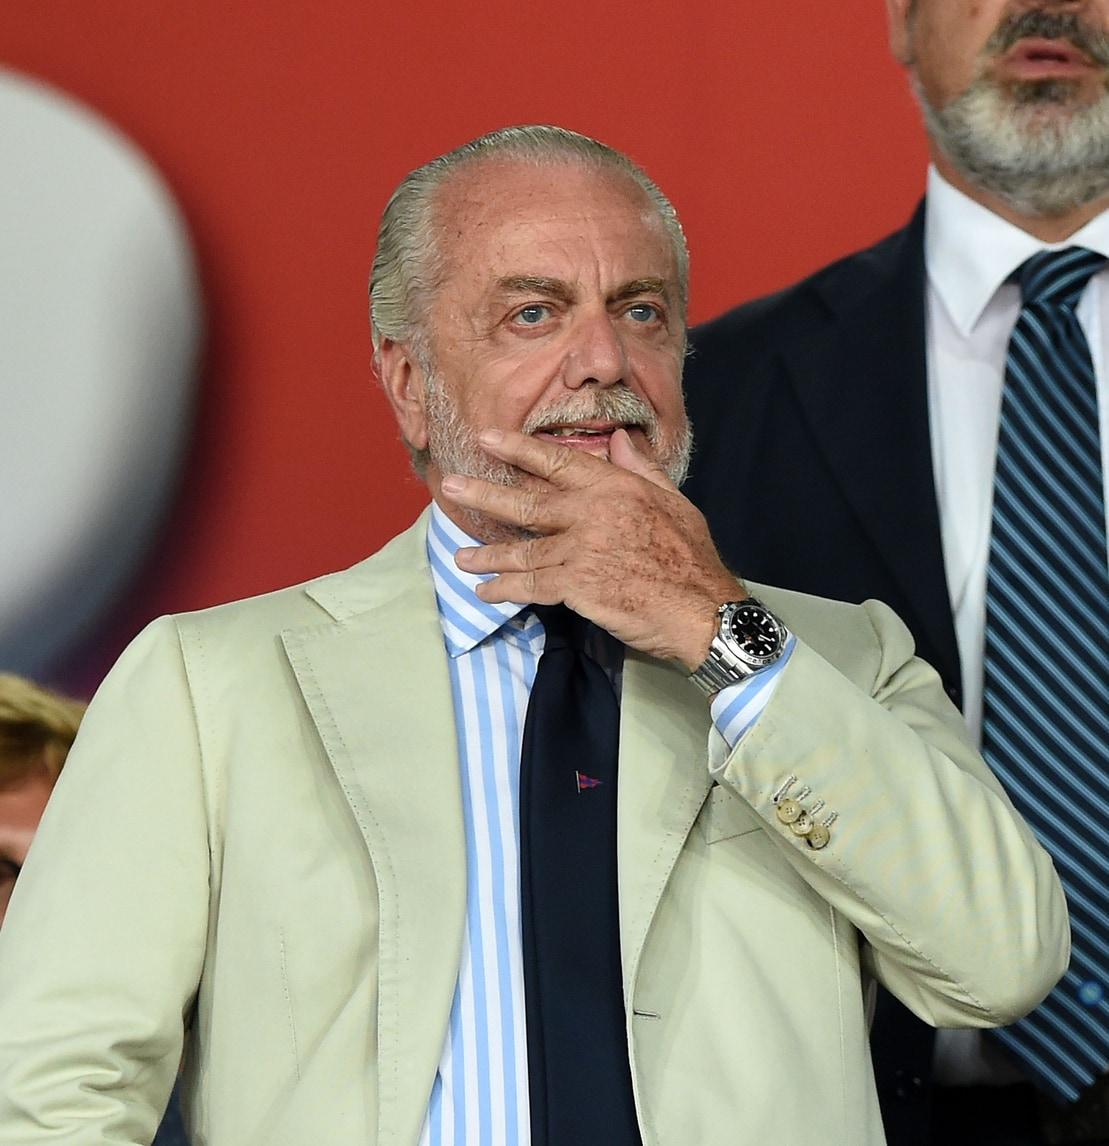 Serie A Napoli, De Laurentiis: «Vorrei stadio da 20mila posti, con 5mila biglietti gratis»